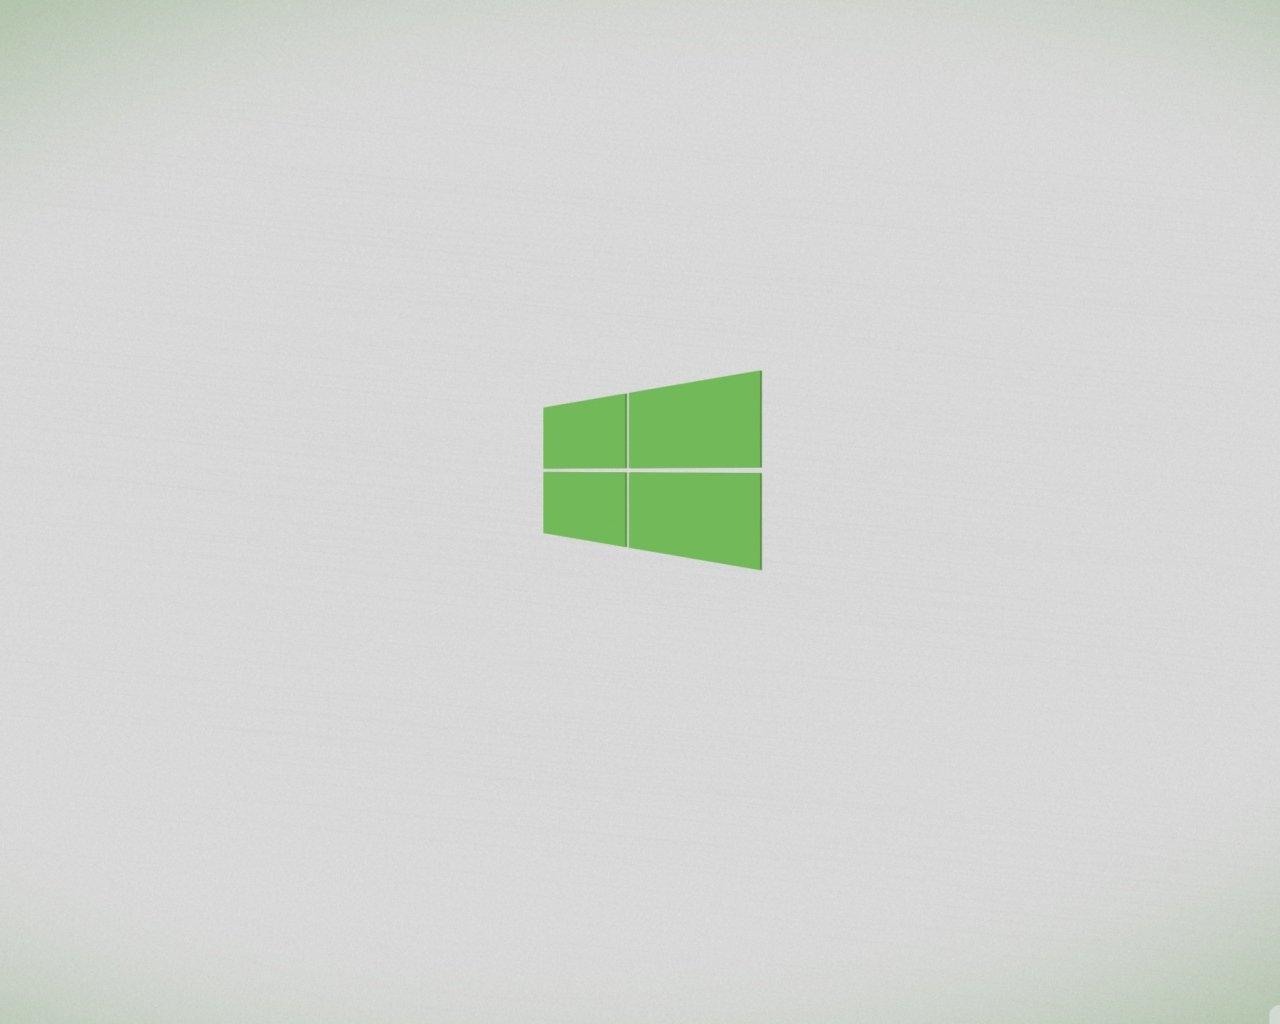 Computers   Windows 8 Windows 8 minimal theme green 042098 10jpg 1280x1024